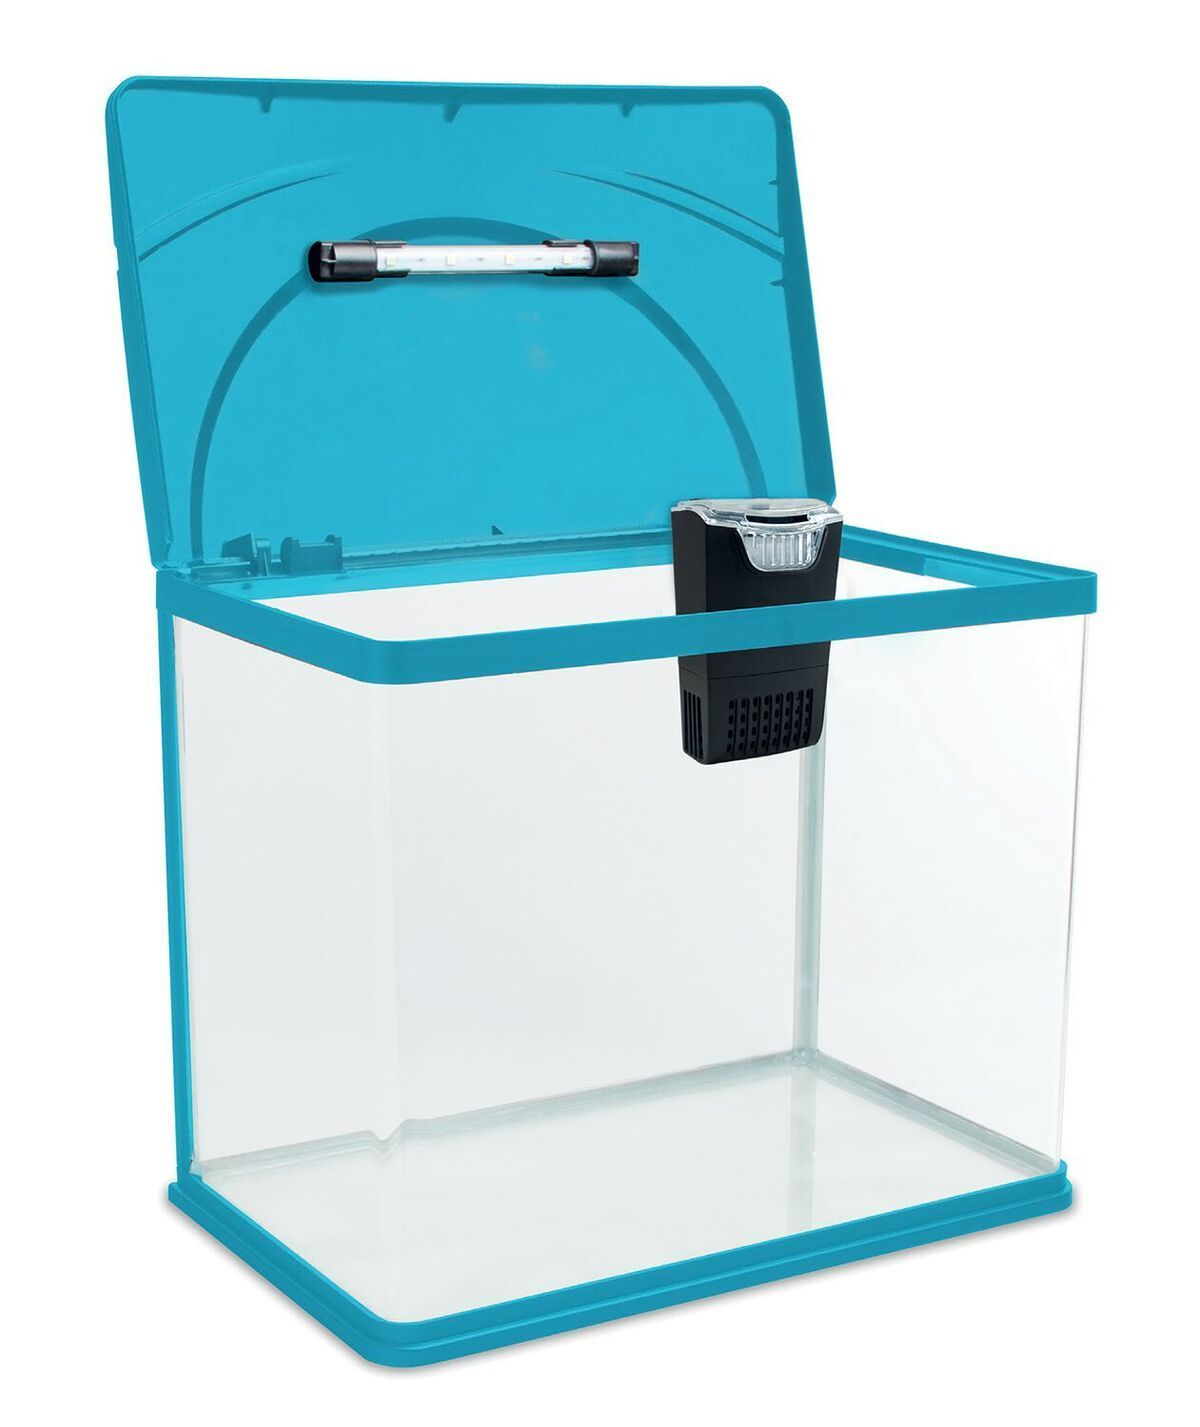 Interpet Fish Box Aquarium Blue 13l 20l With Cf Mini